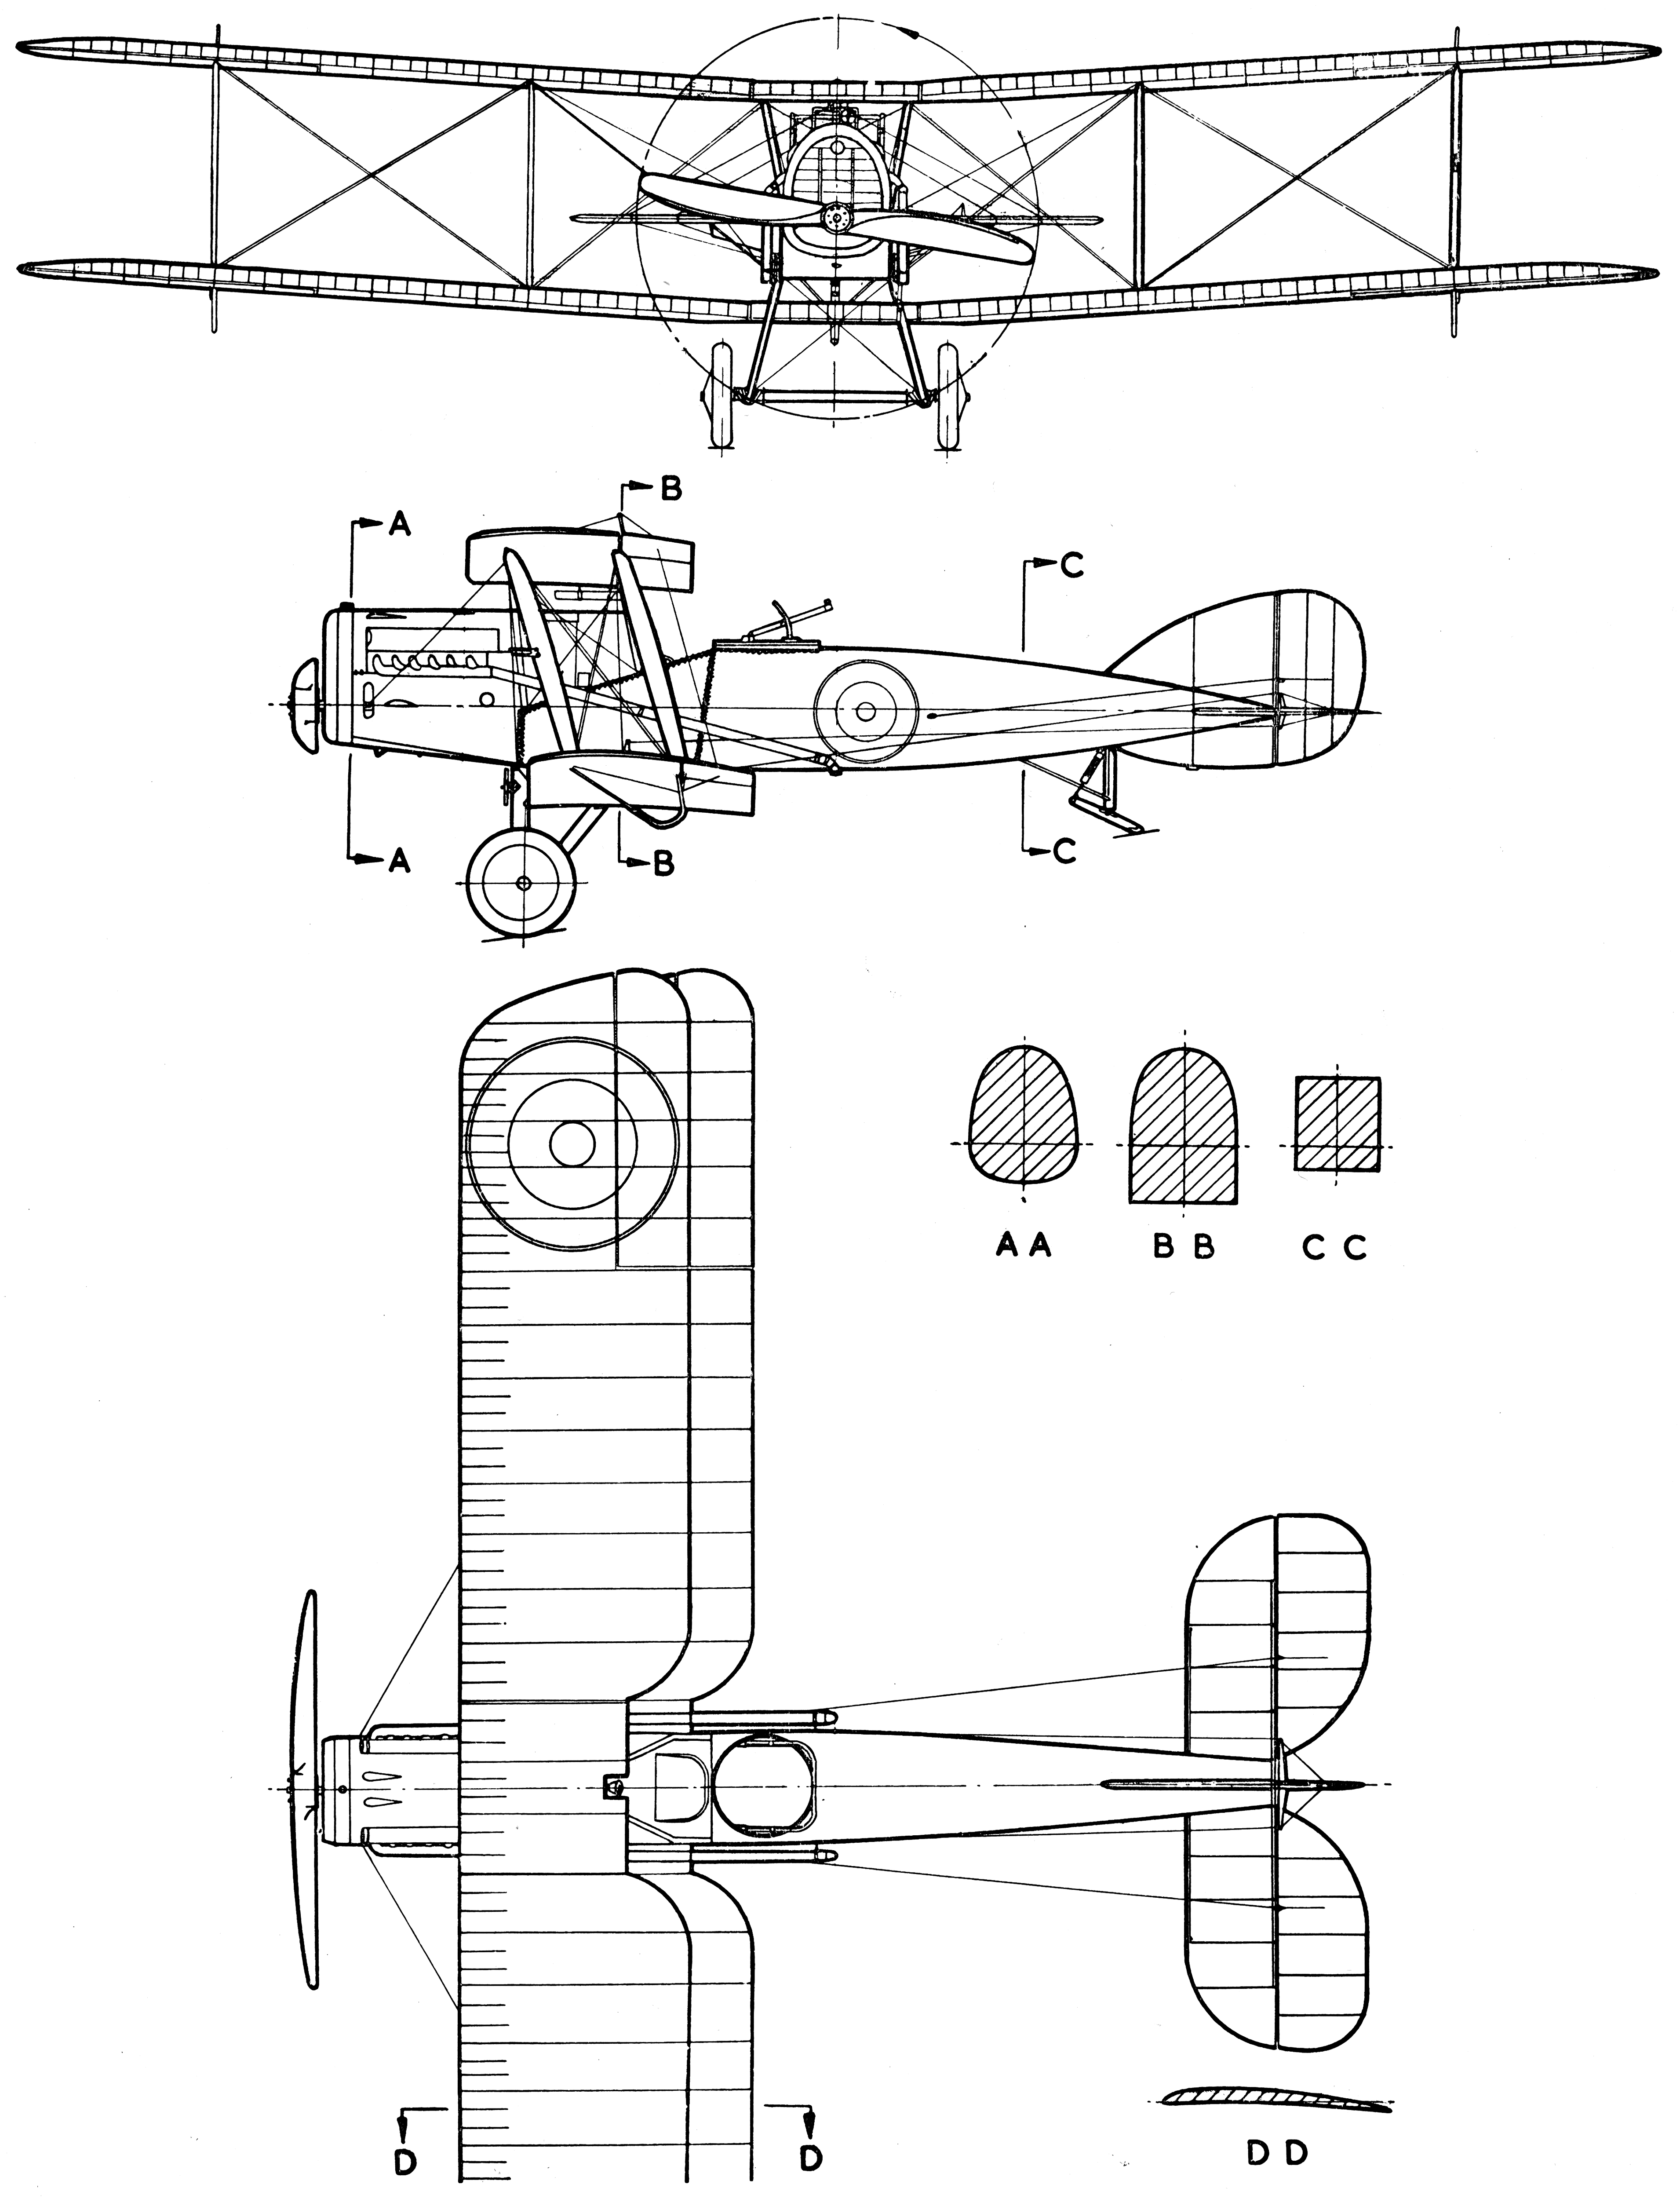 Bristol F 2 Fighter Blueprint